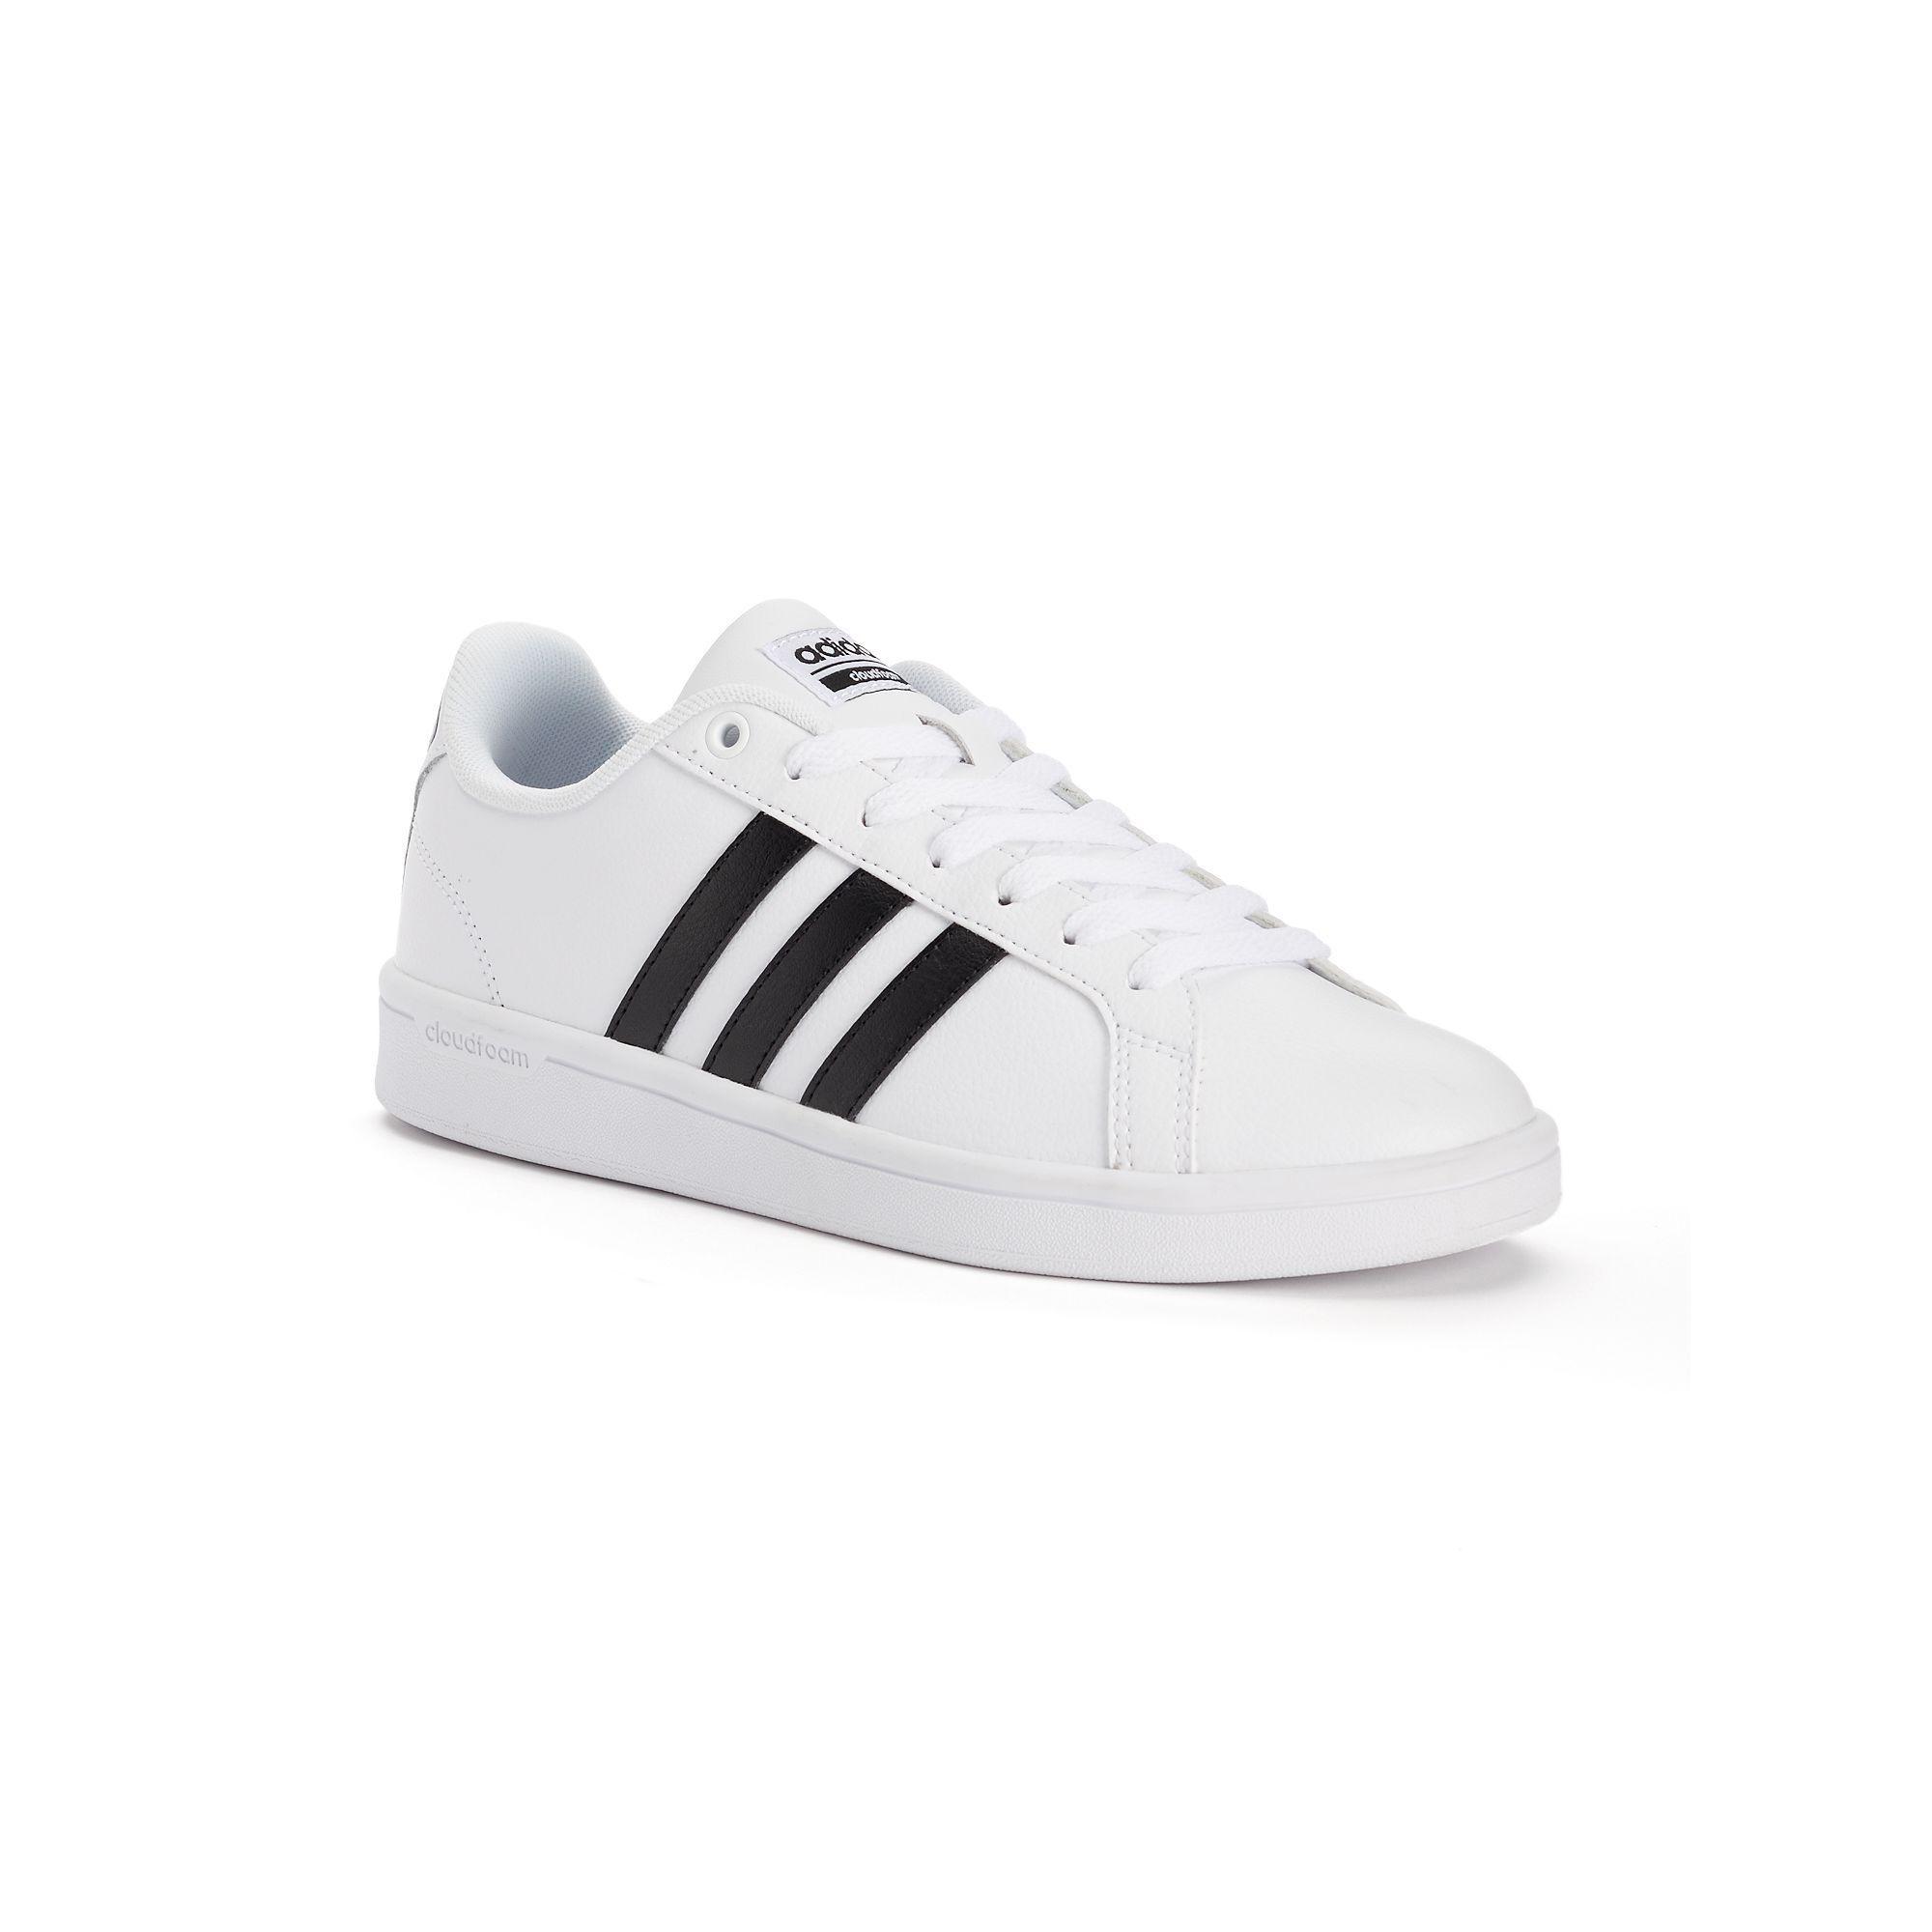 wholesale dealer fddf9 516be ... White AW4306 Adidas NEO Cloudfoam Advantage Stripe Women s Shoes, Size   10, ...